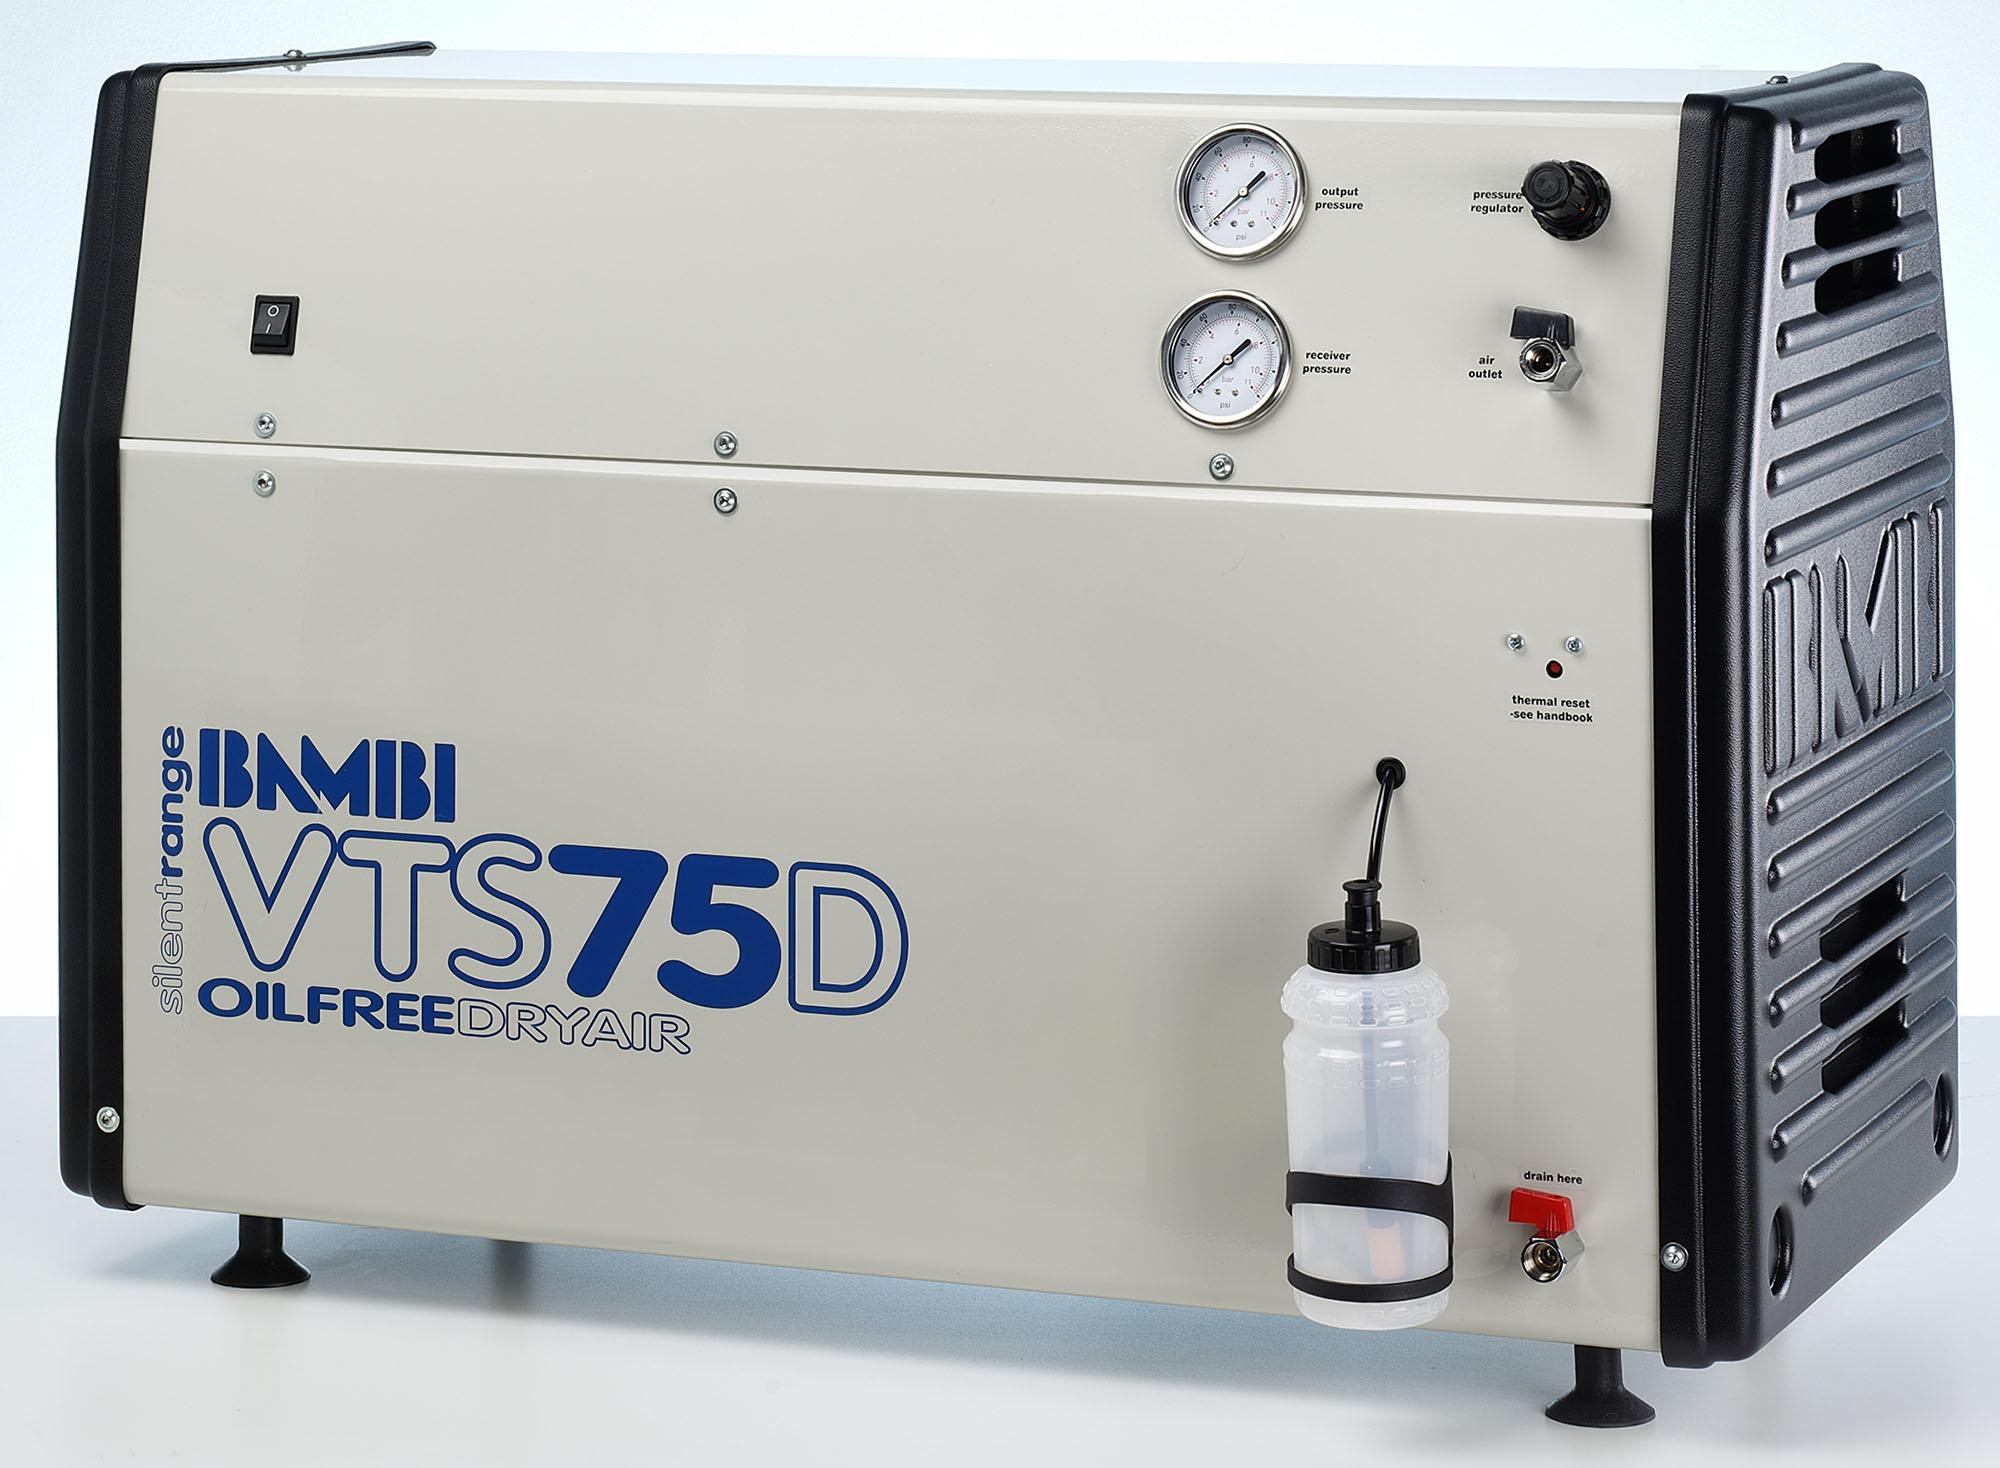 Midlands UK supplier of Bambi VTS75D air compressor